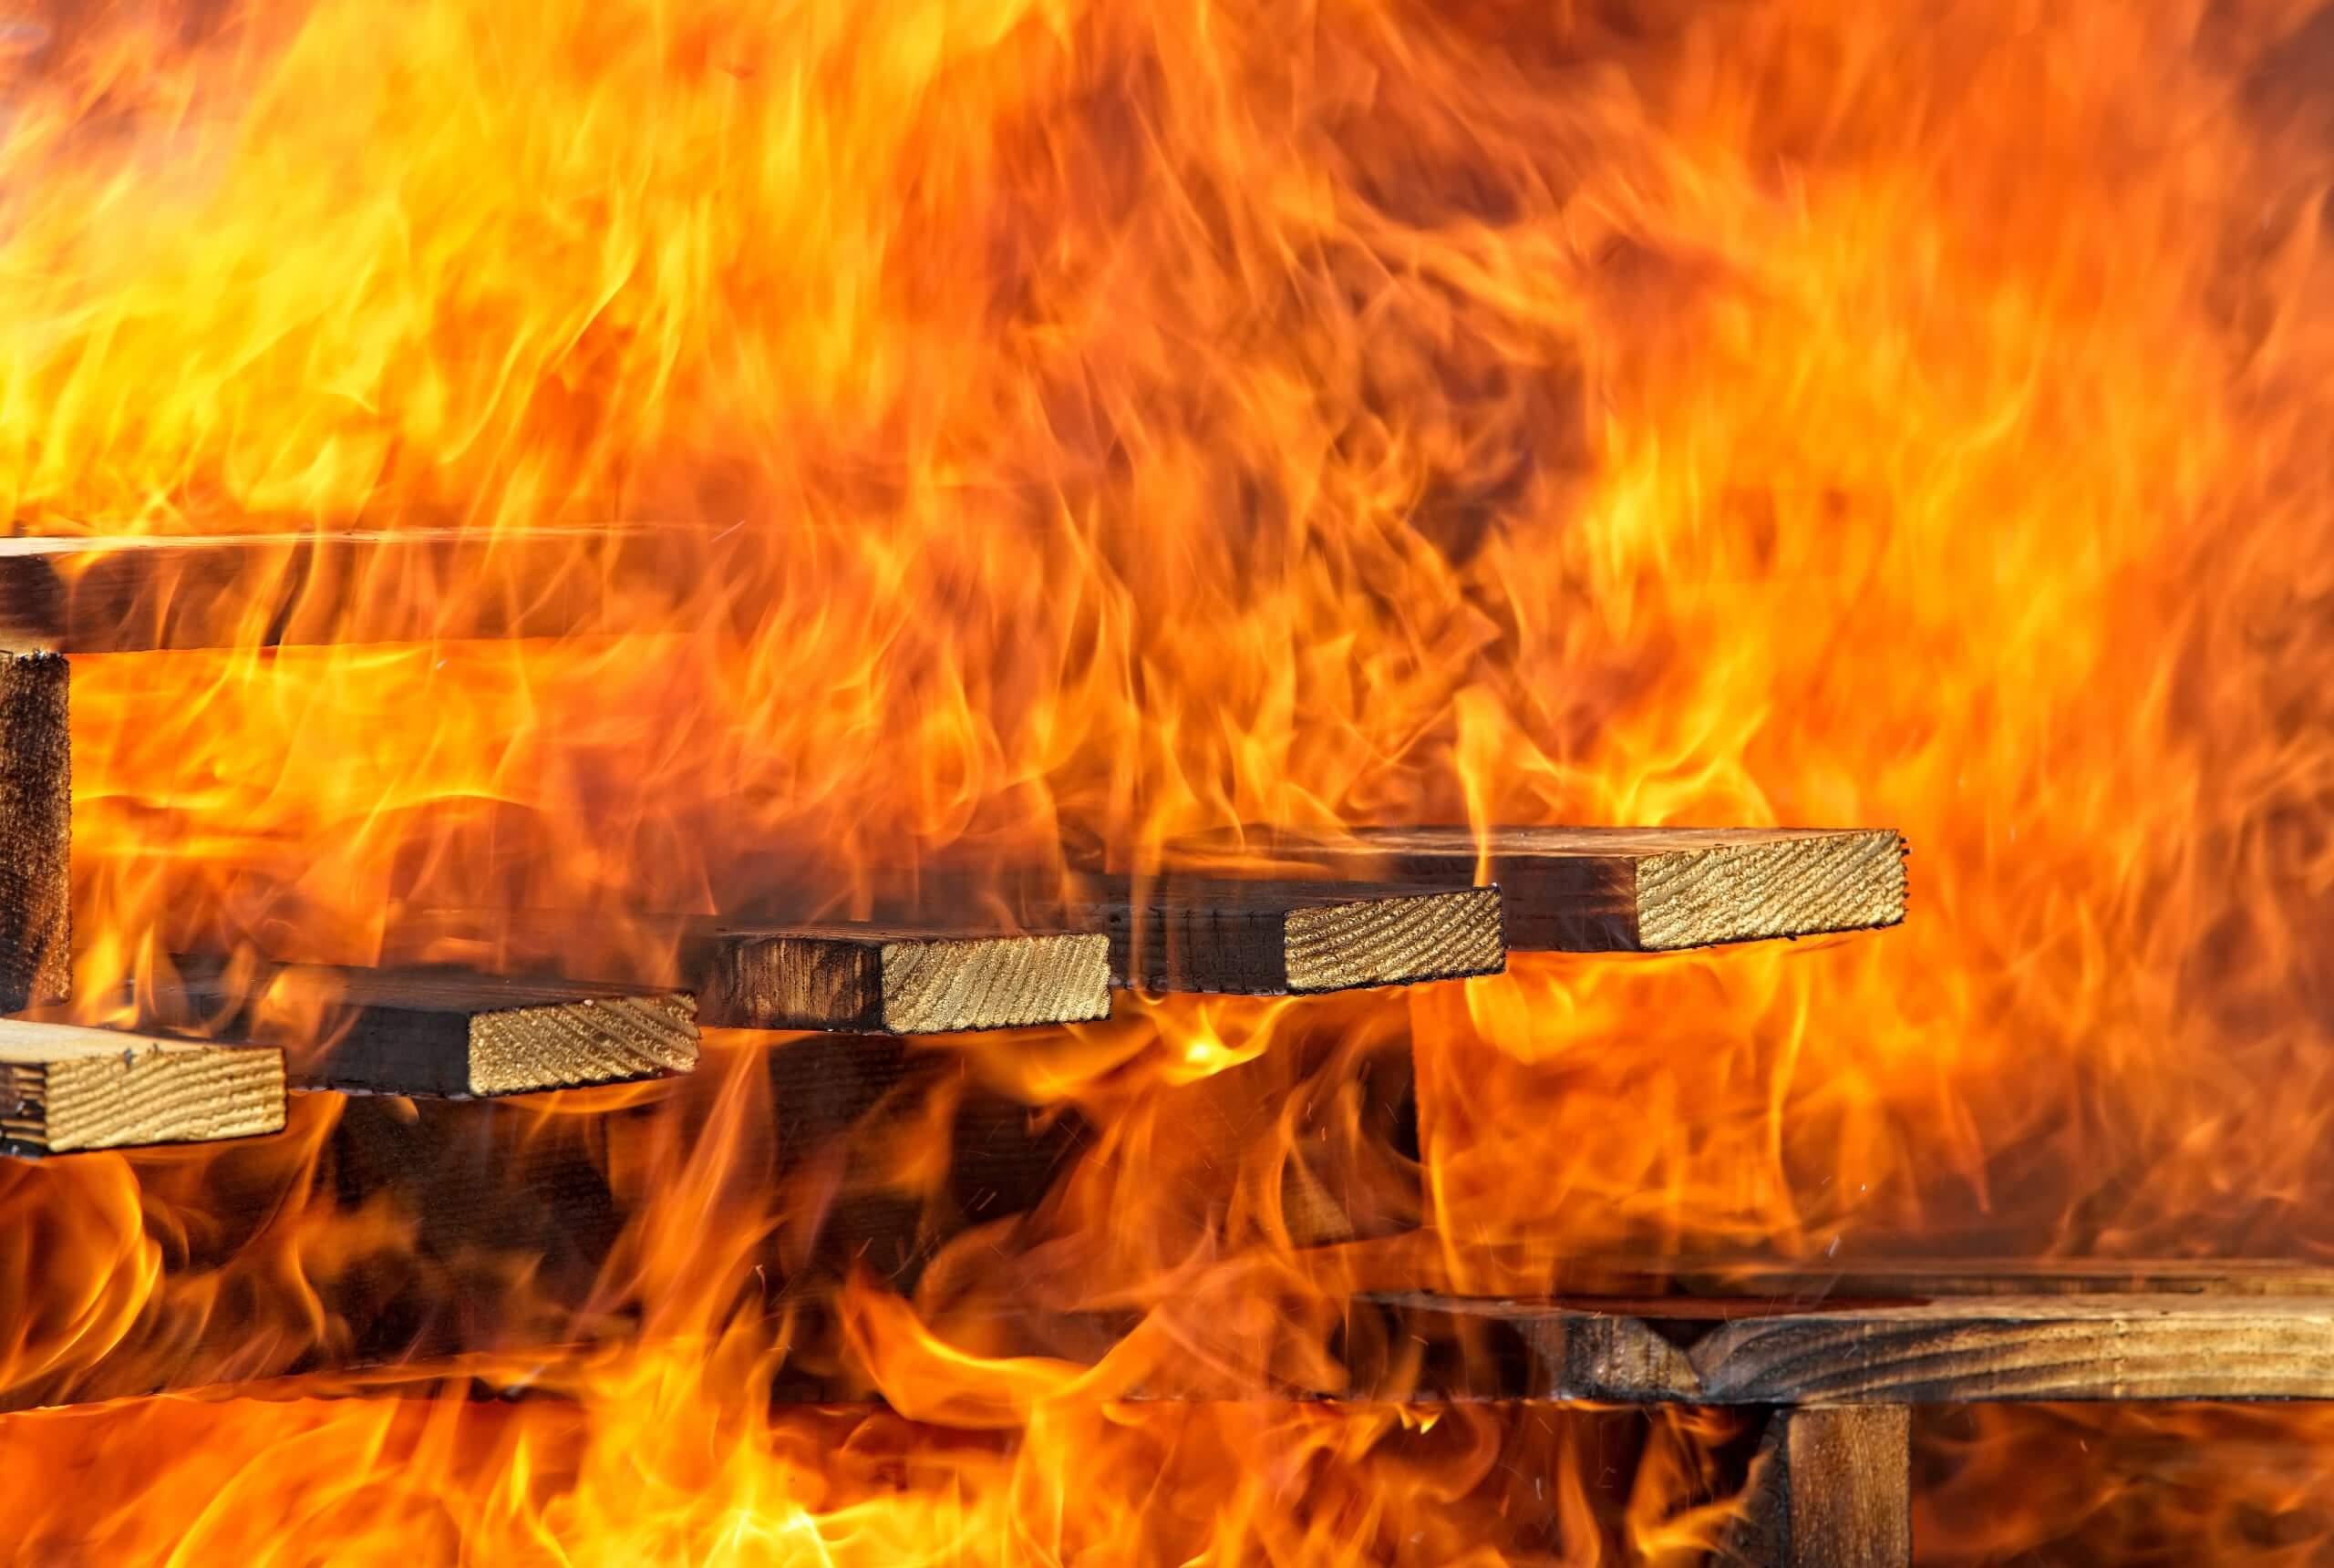 Požar na građevinskom objektu: Mladić napravio kobnu grešku